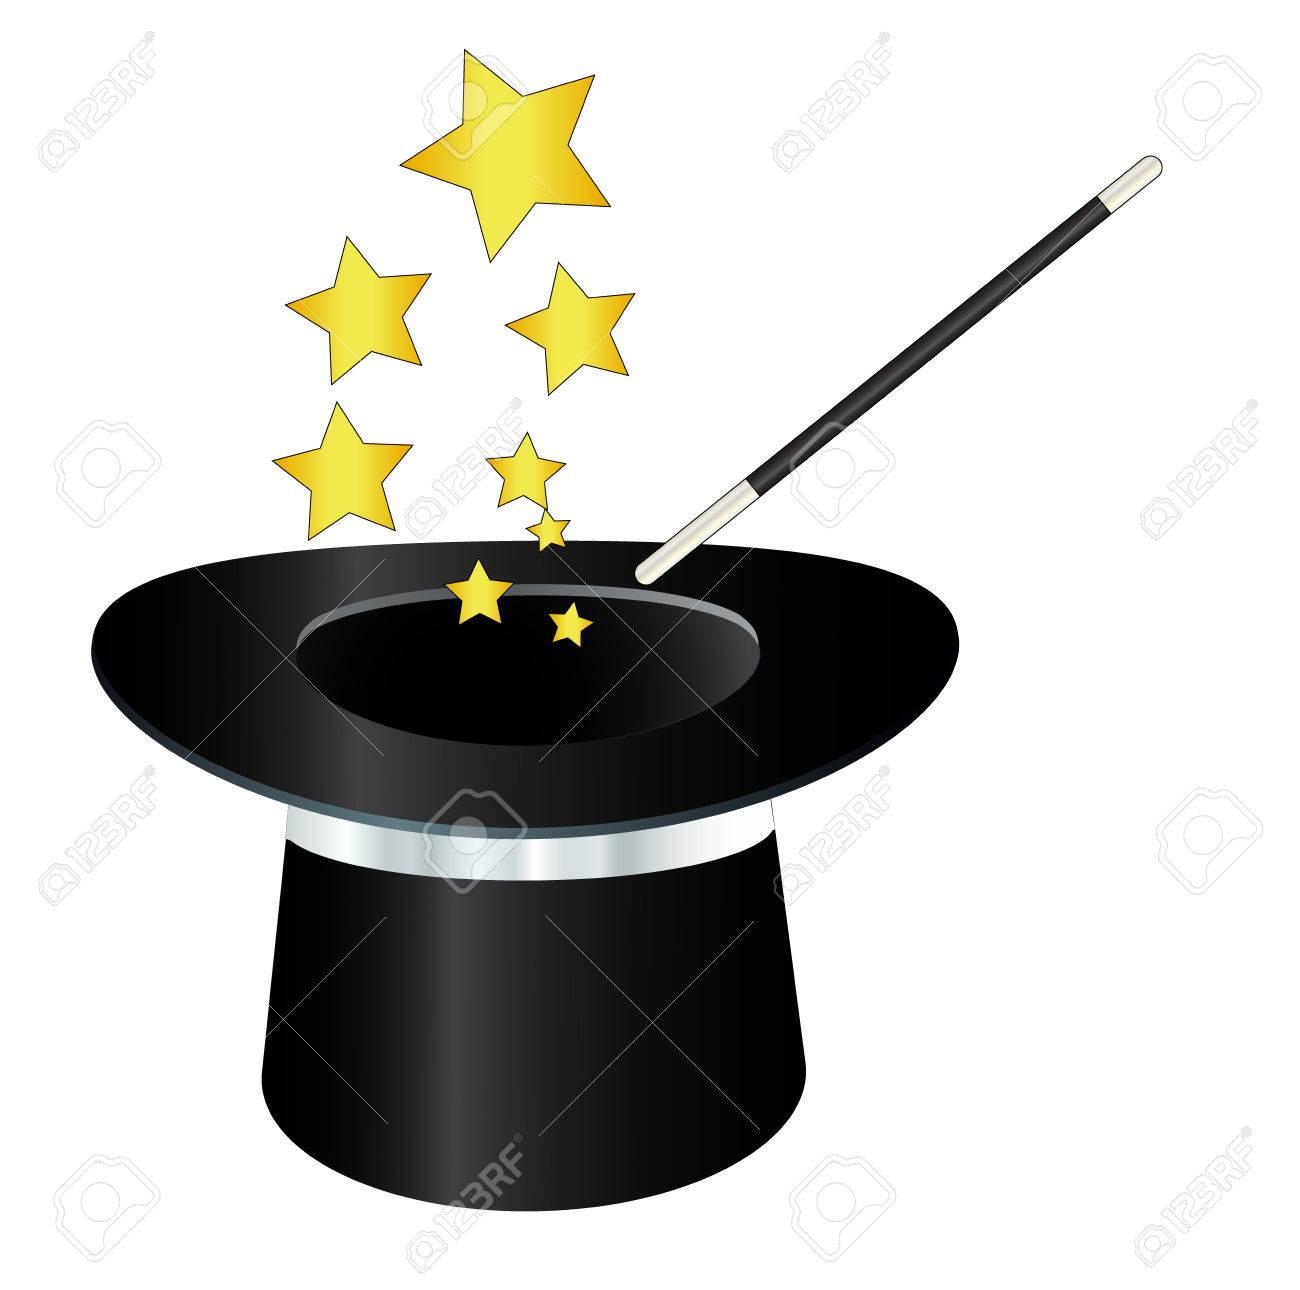 d9c7c46928c Cilindro sombrero mágico con la varita